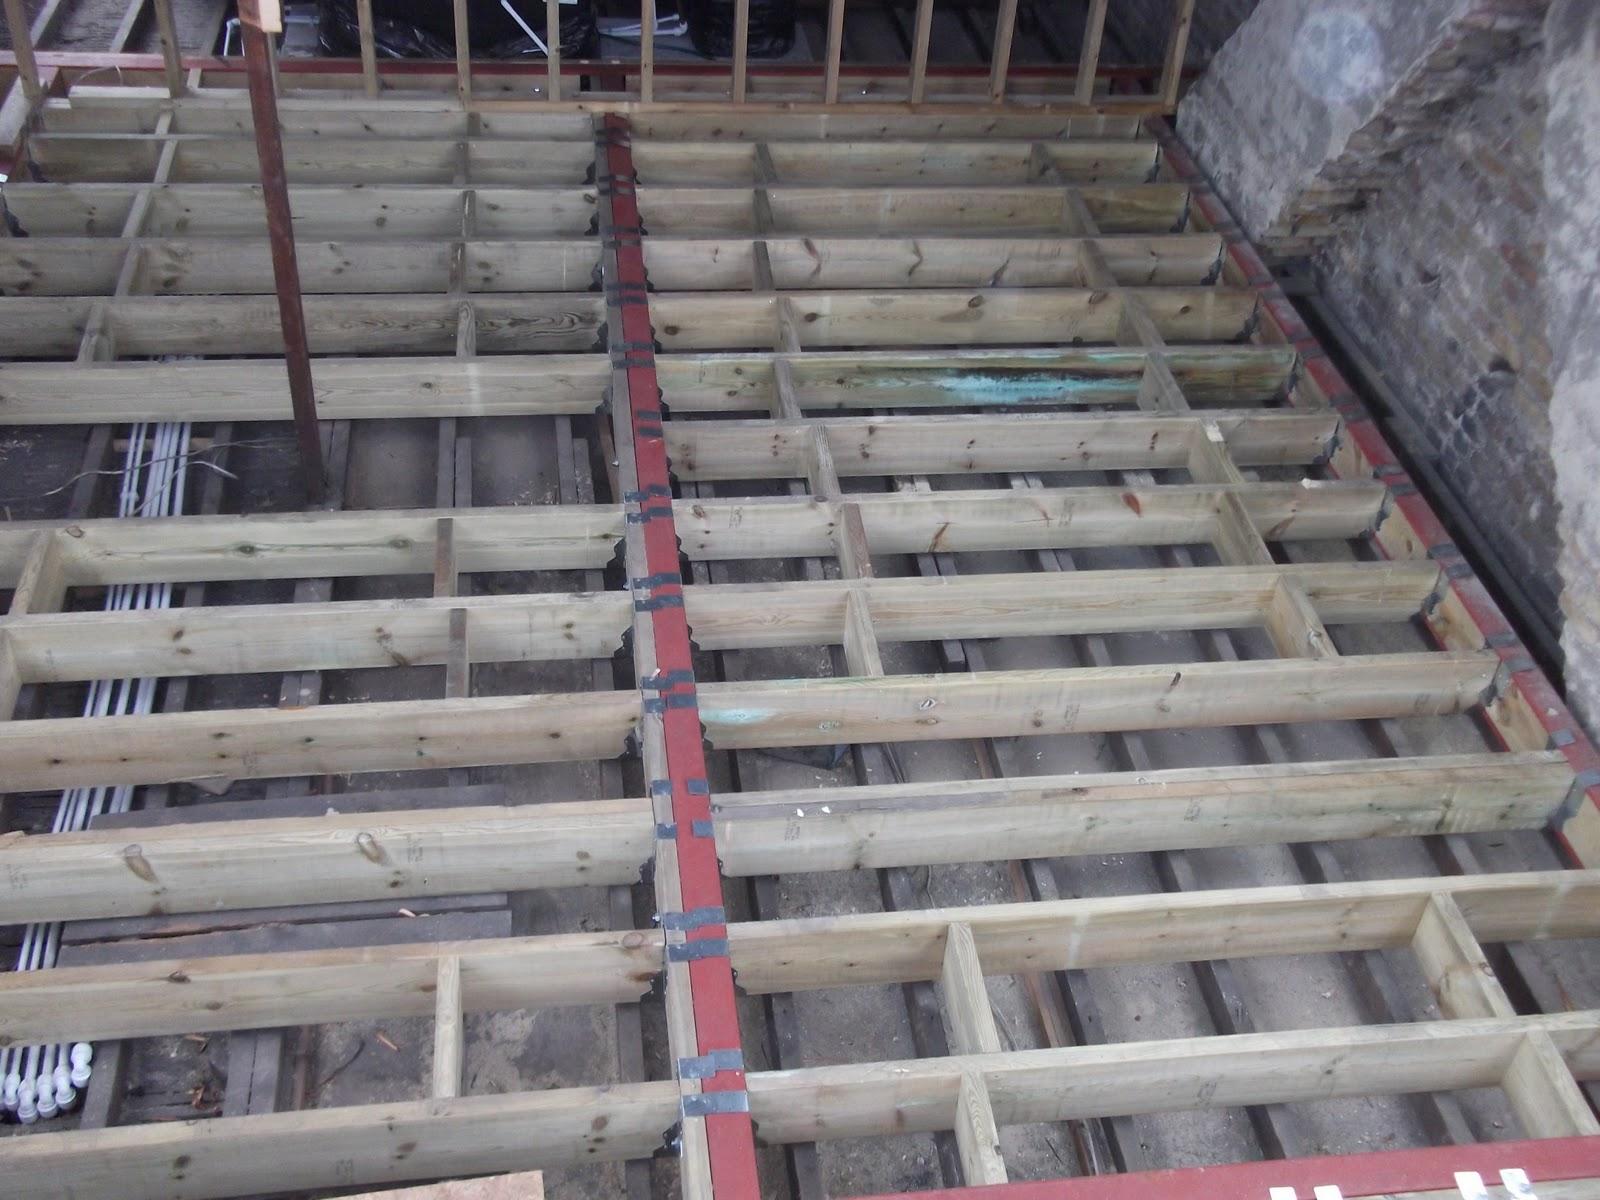 Loft conversion a how to guide for Loft floor construction